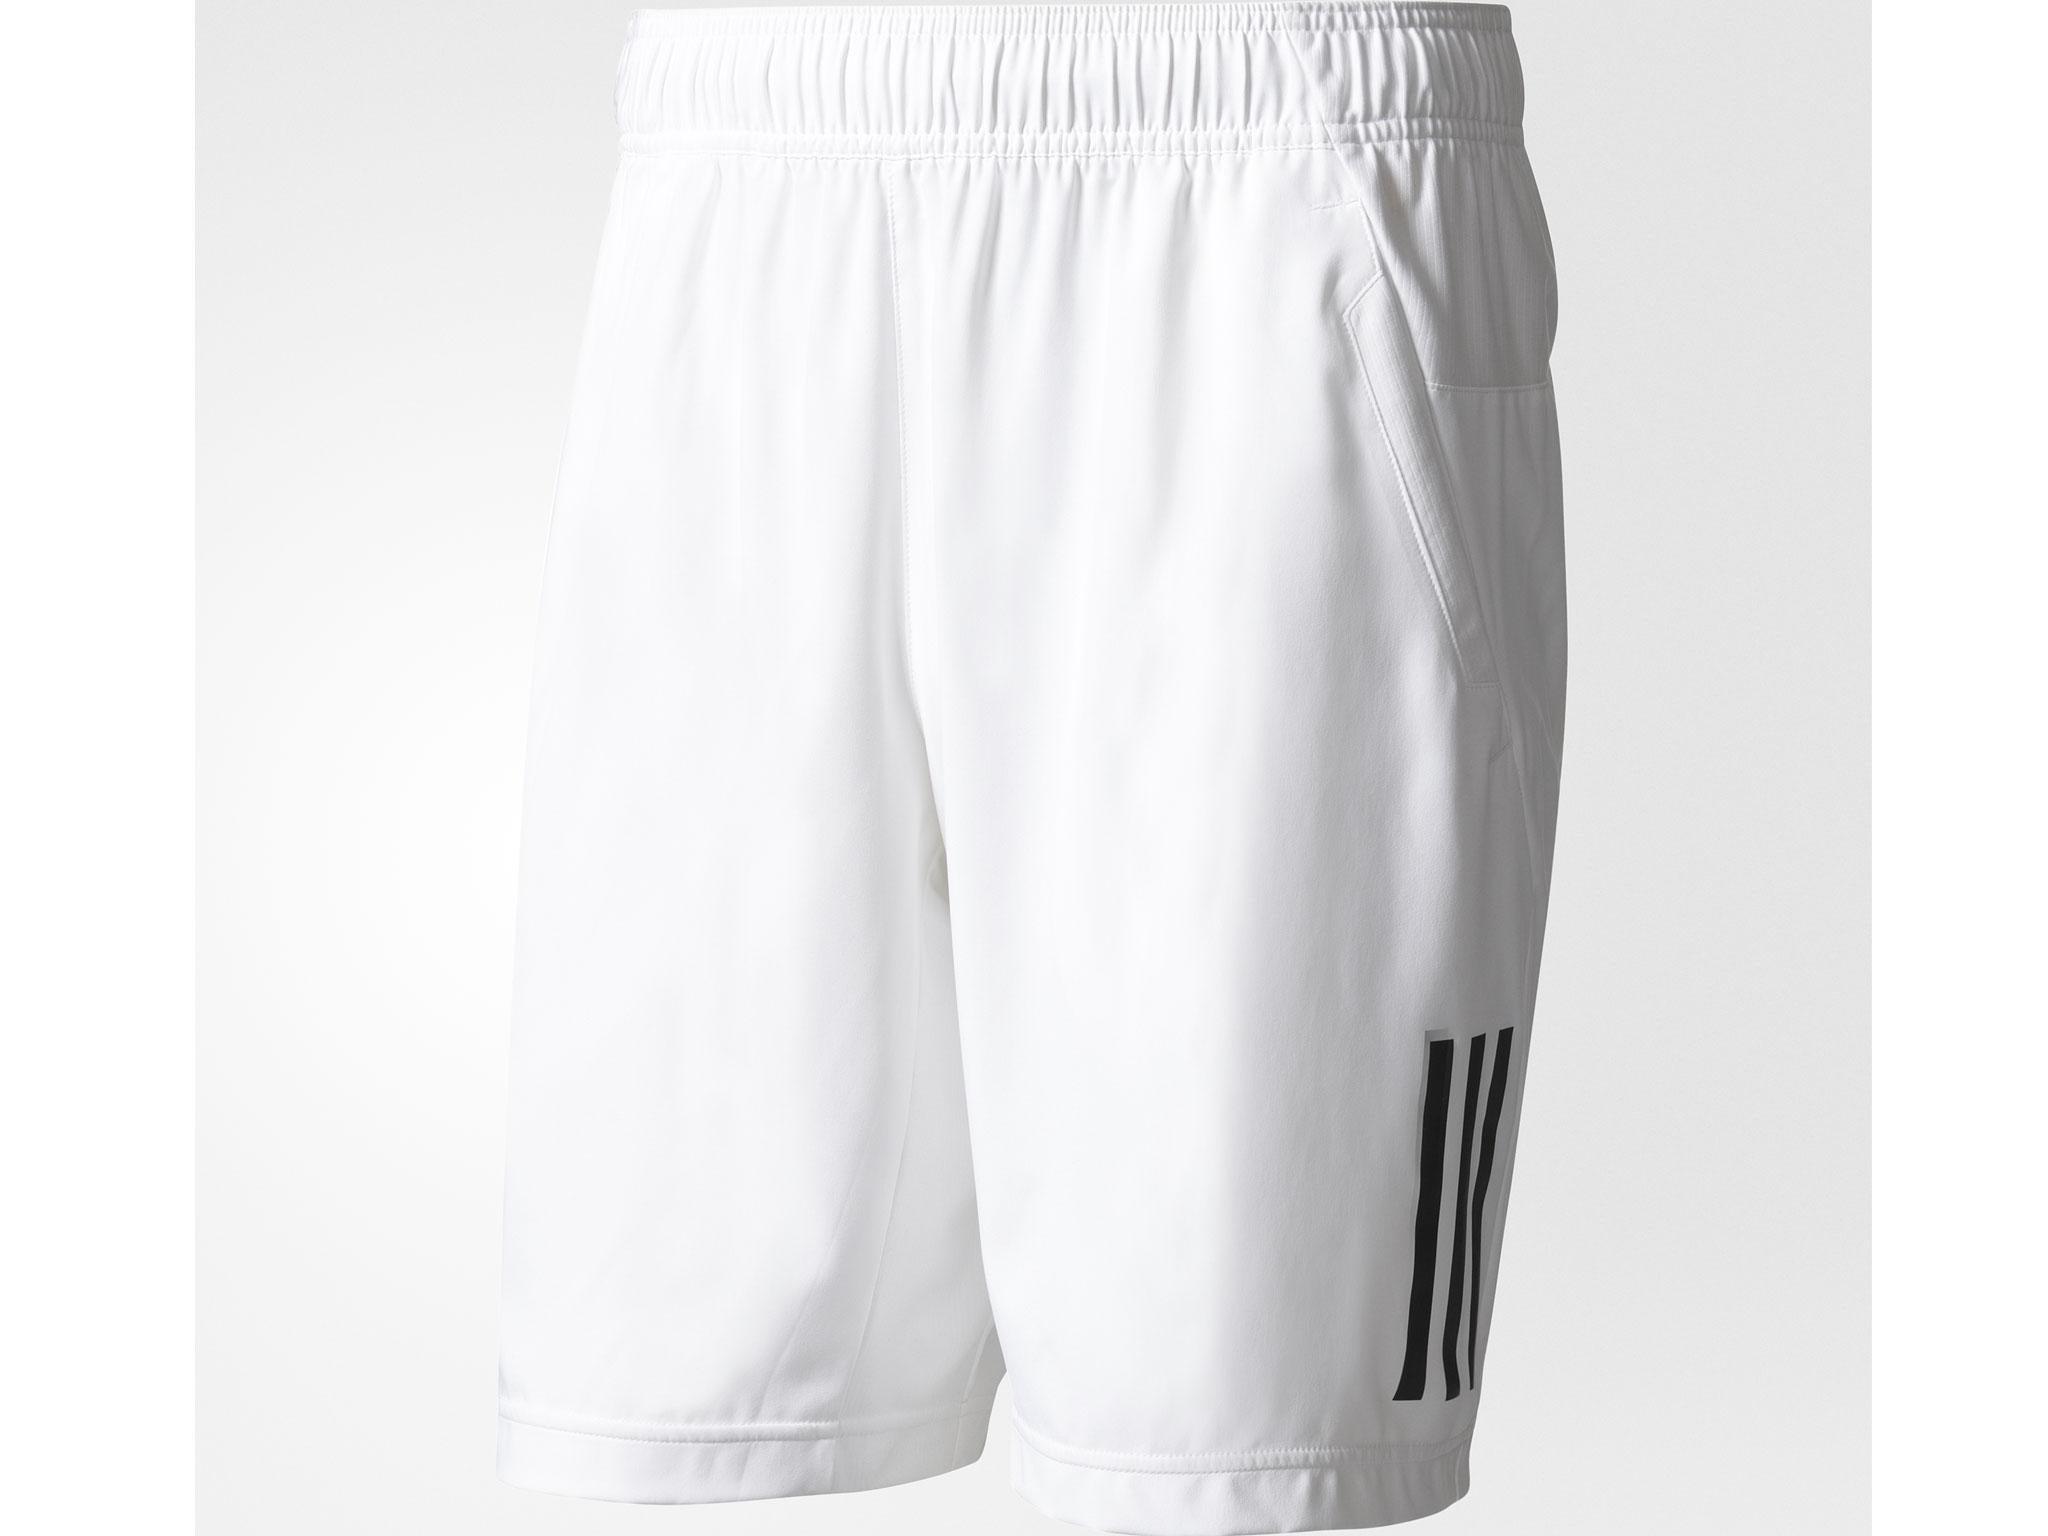 Slazenger Woven Shorts Mens Black Gym Fitness Lifestyle Sportswear